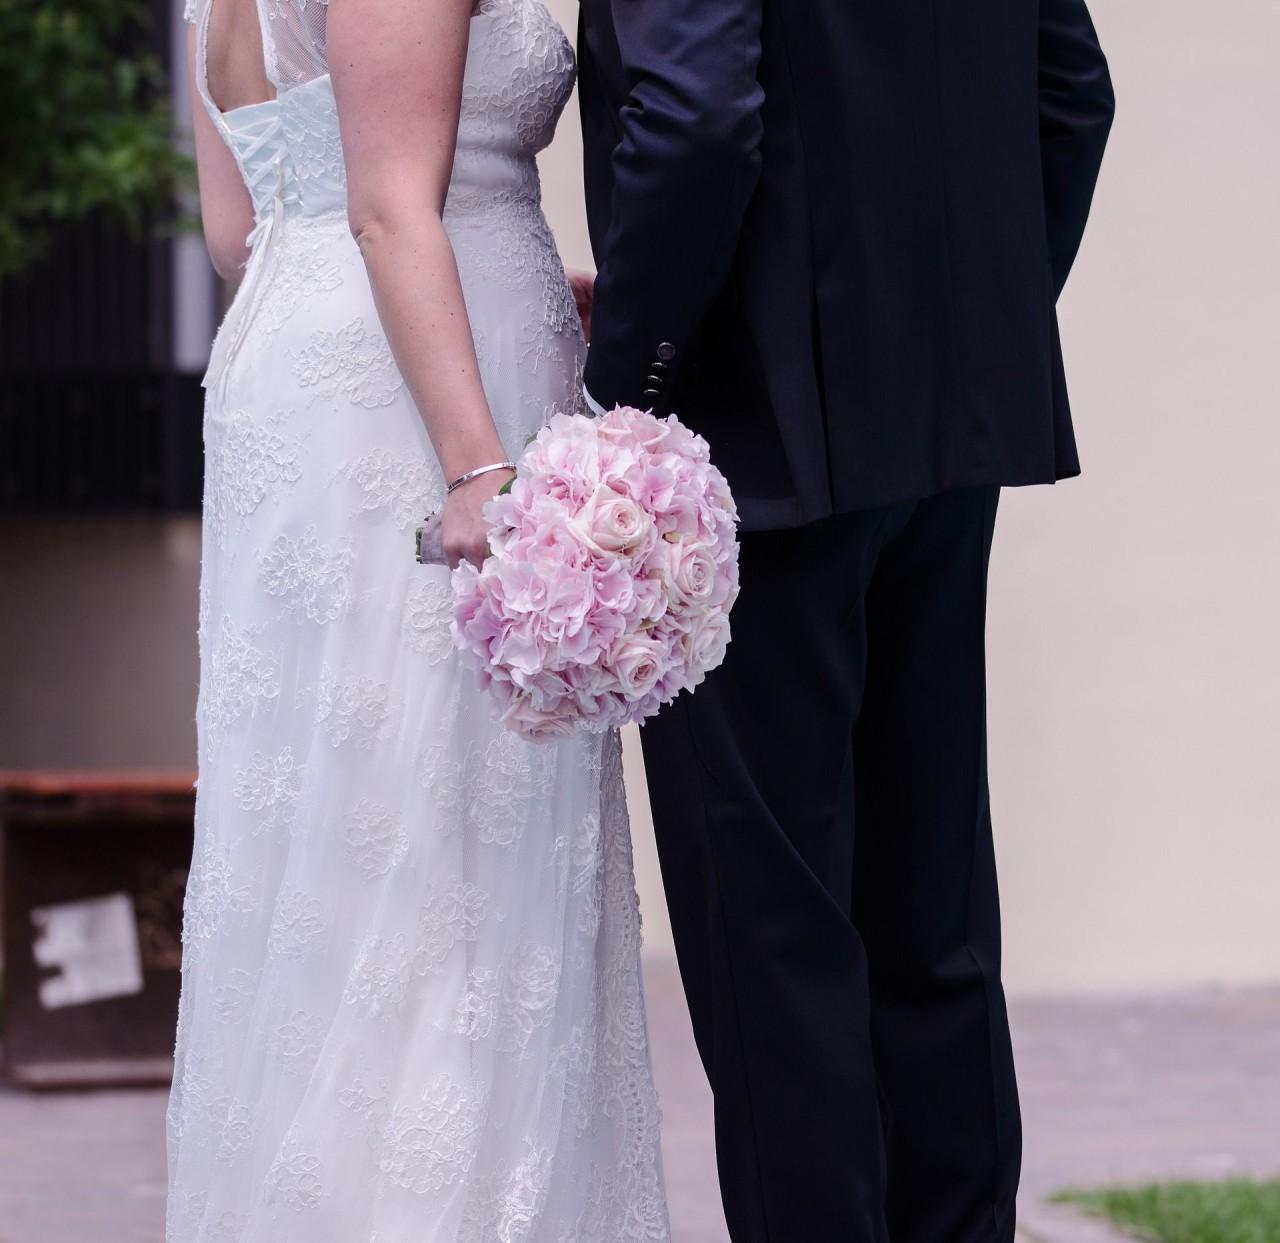 wedding-1578192_1920